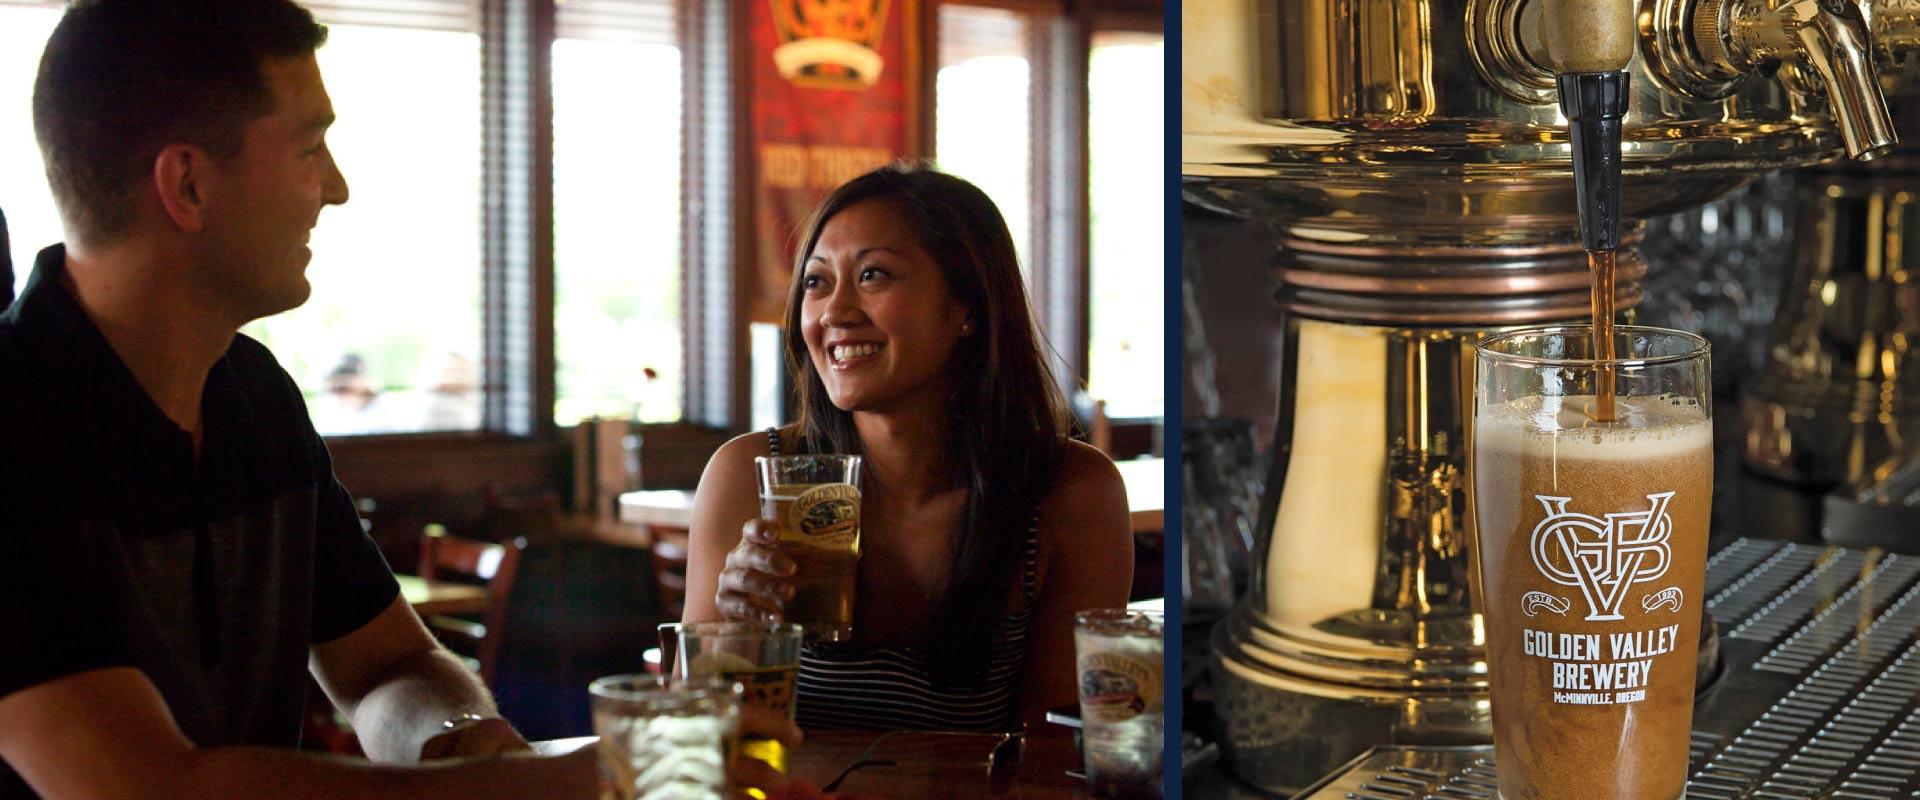 Contact Golden Valley Brewery & Restaurant